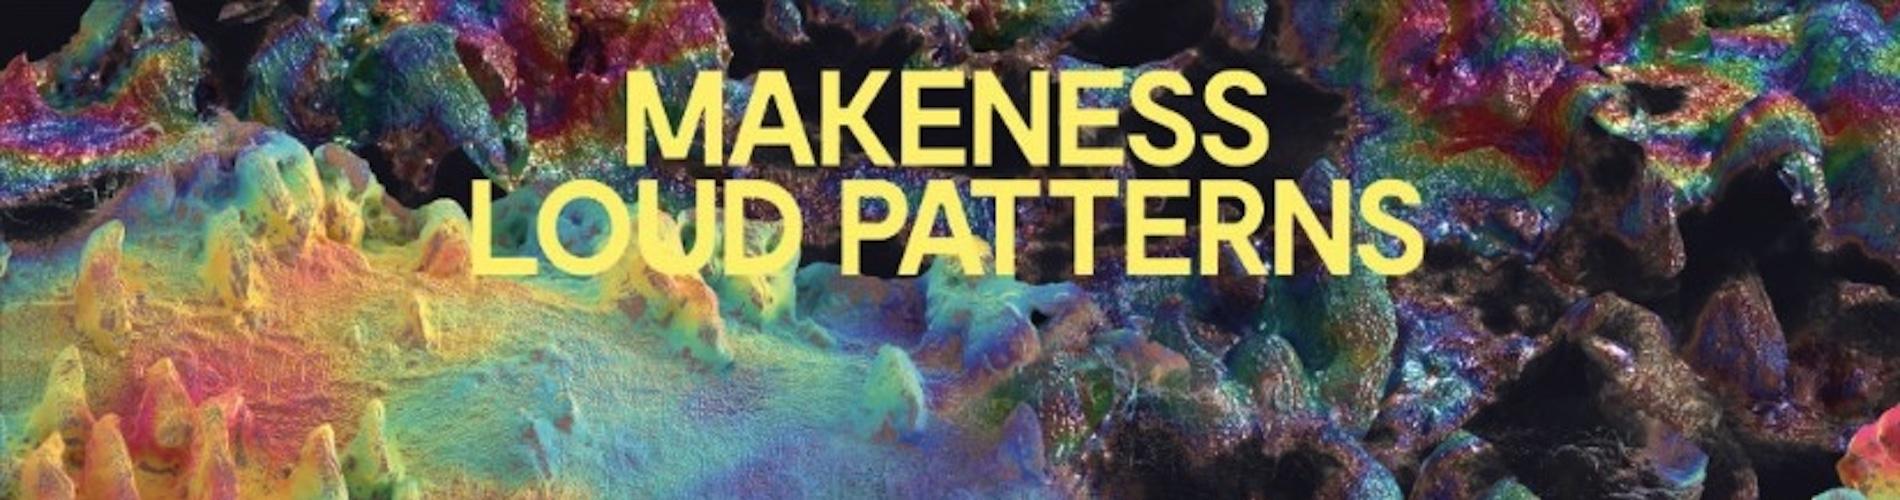 Makeness-Loud-Patterns-Banner